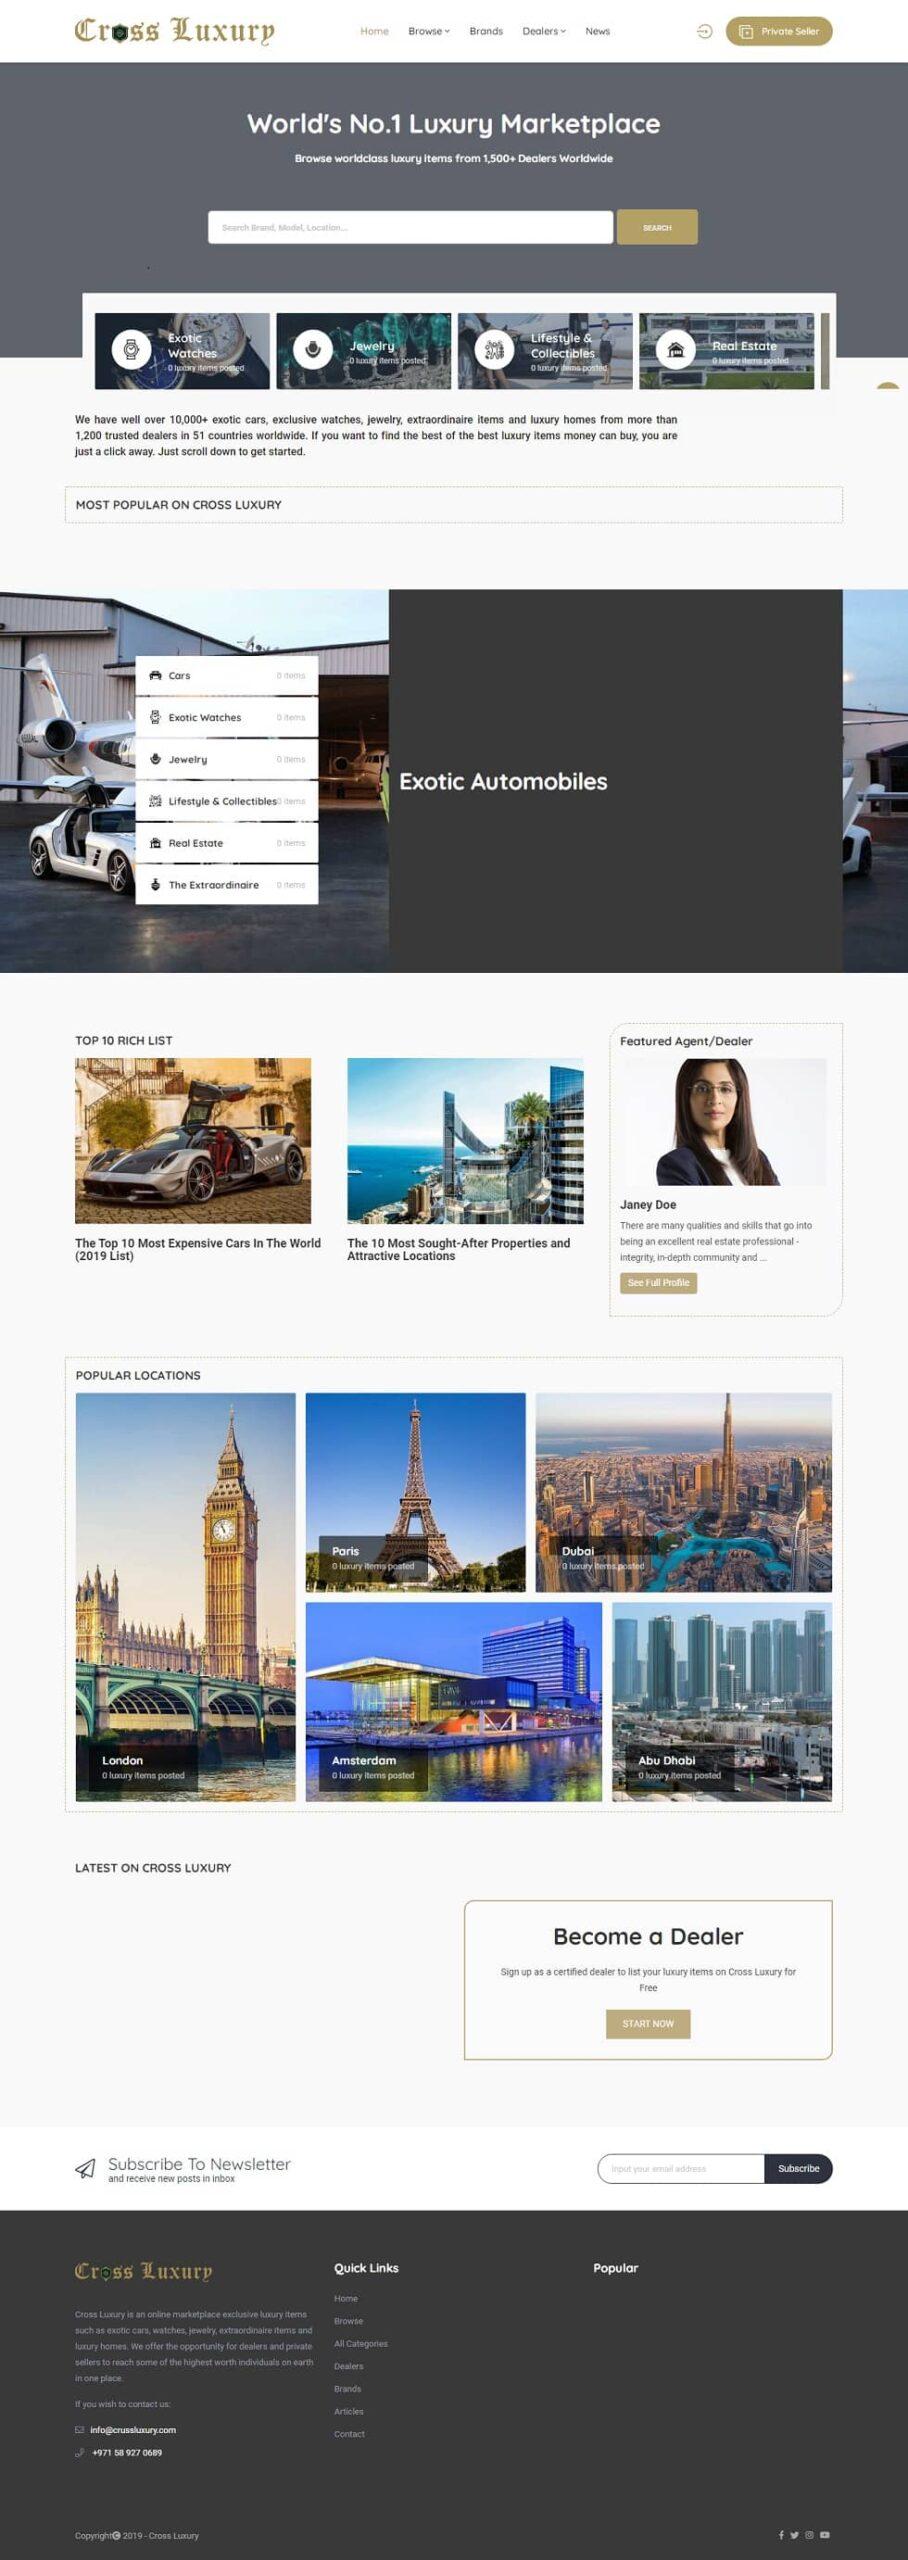 Web design Nigeria - Cross Luxury Dubai